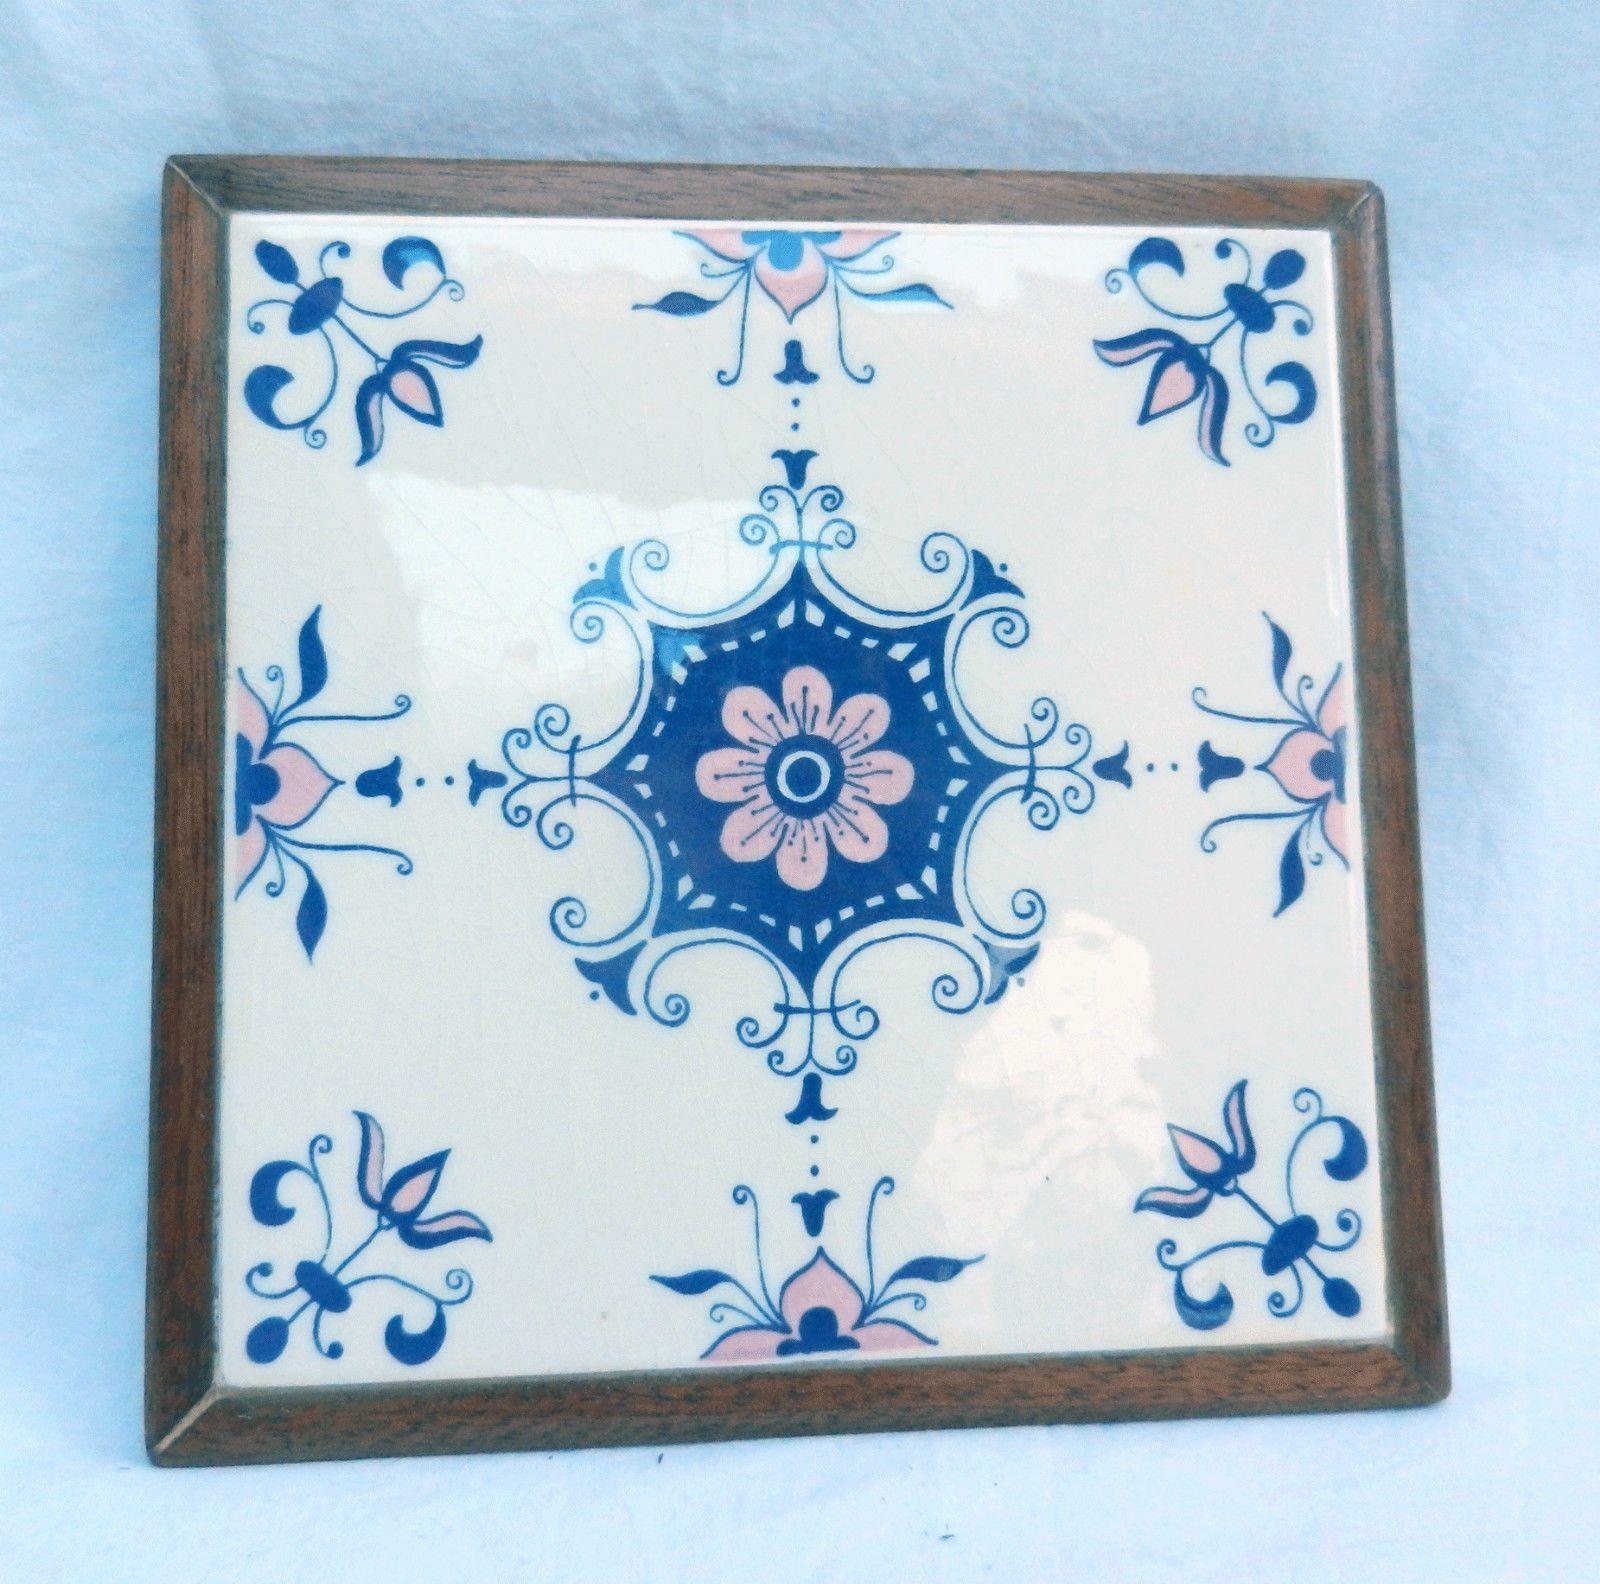 Ceramic tile trivet heat resistant pot stand with wooden frame and ceramic tile trivet heat resistant pot stand with wooden frame and cork back dailygadgetfo Choice Image